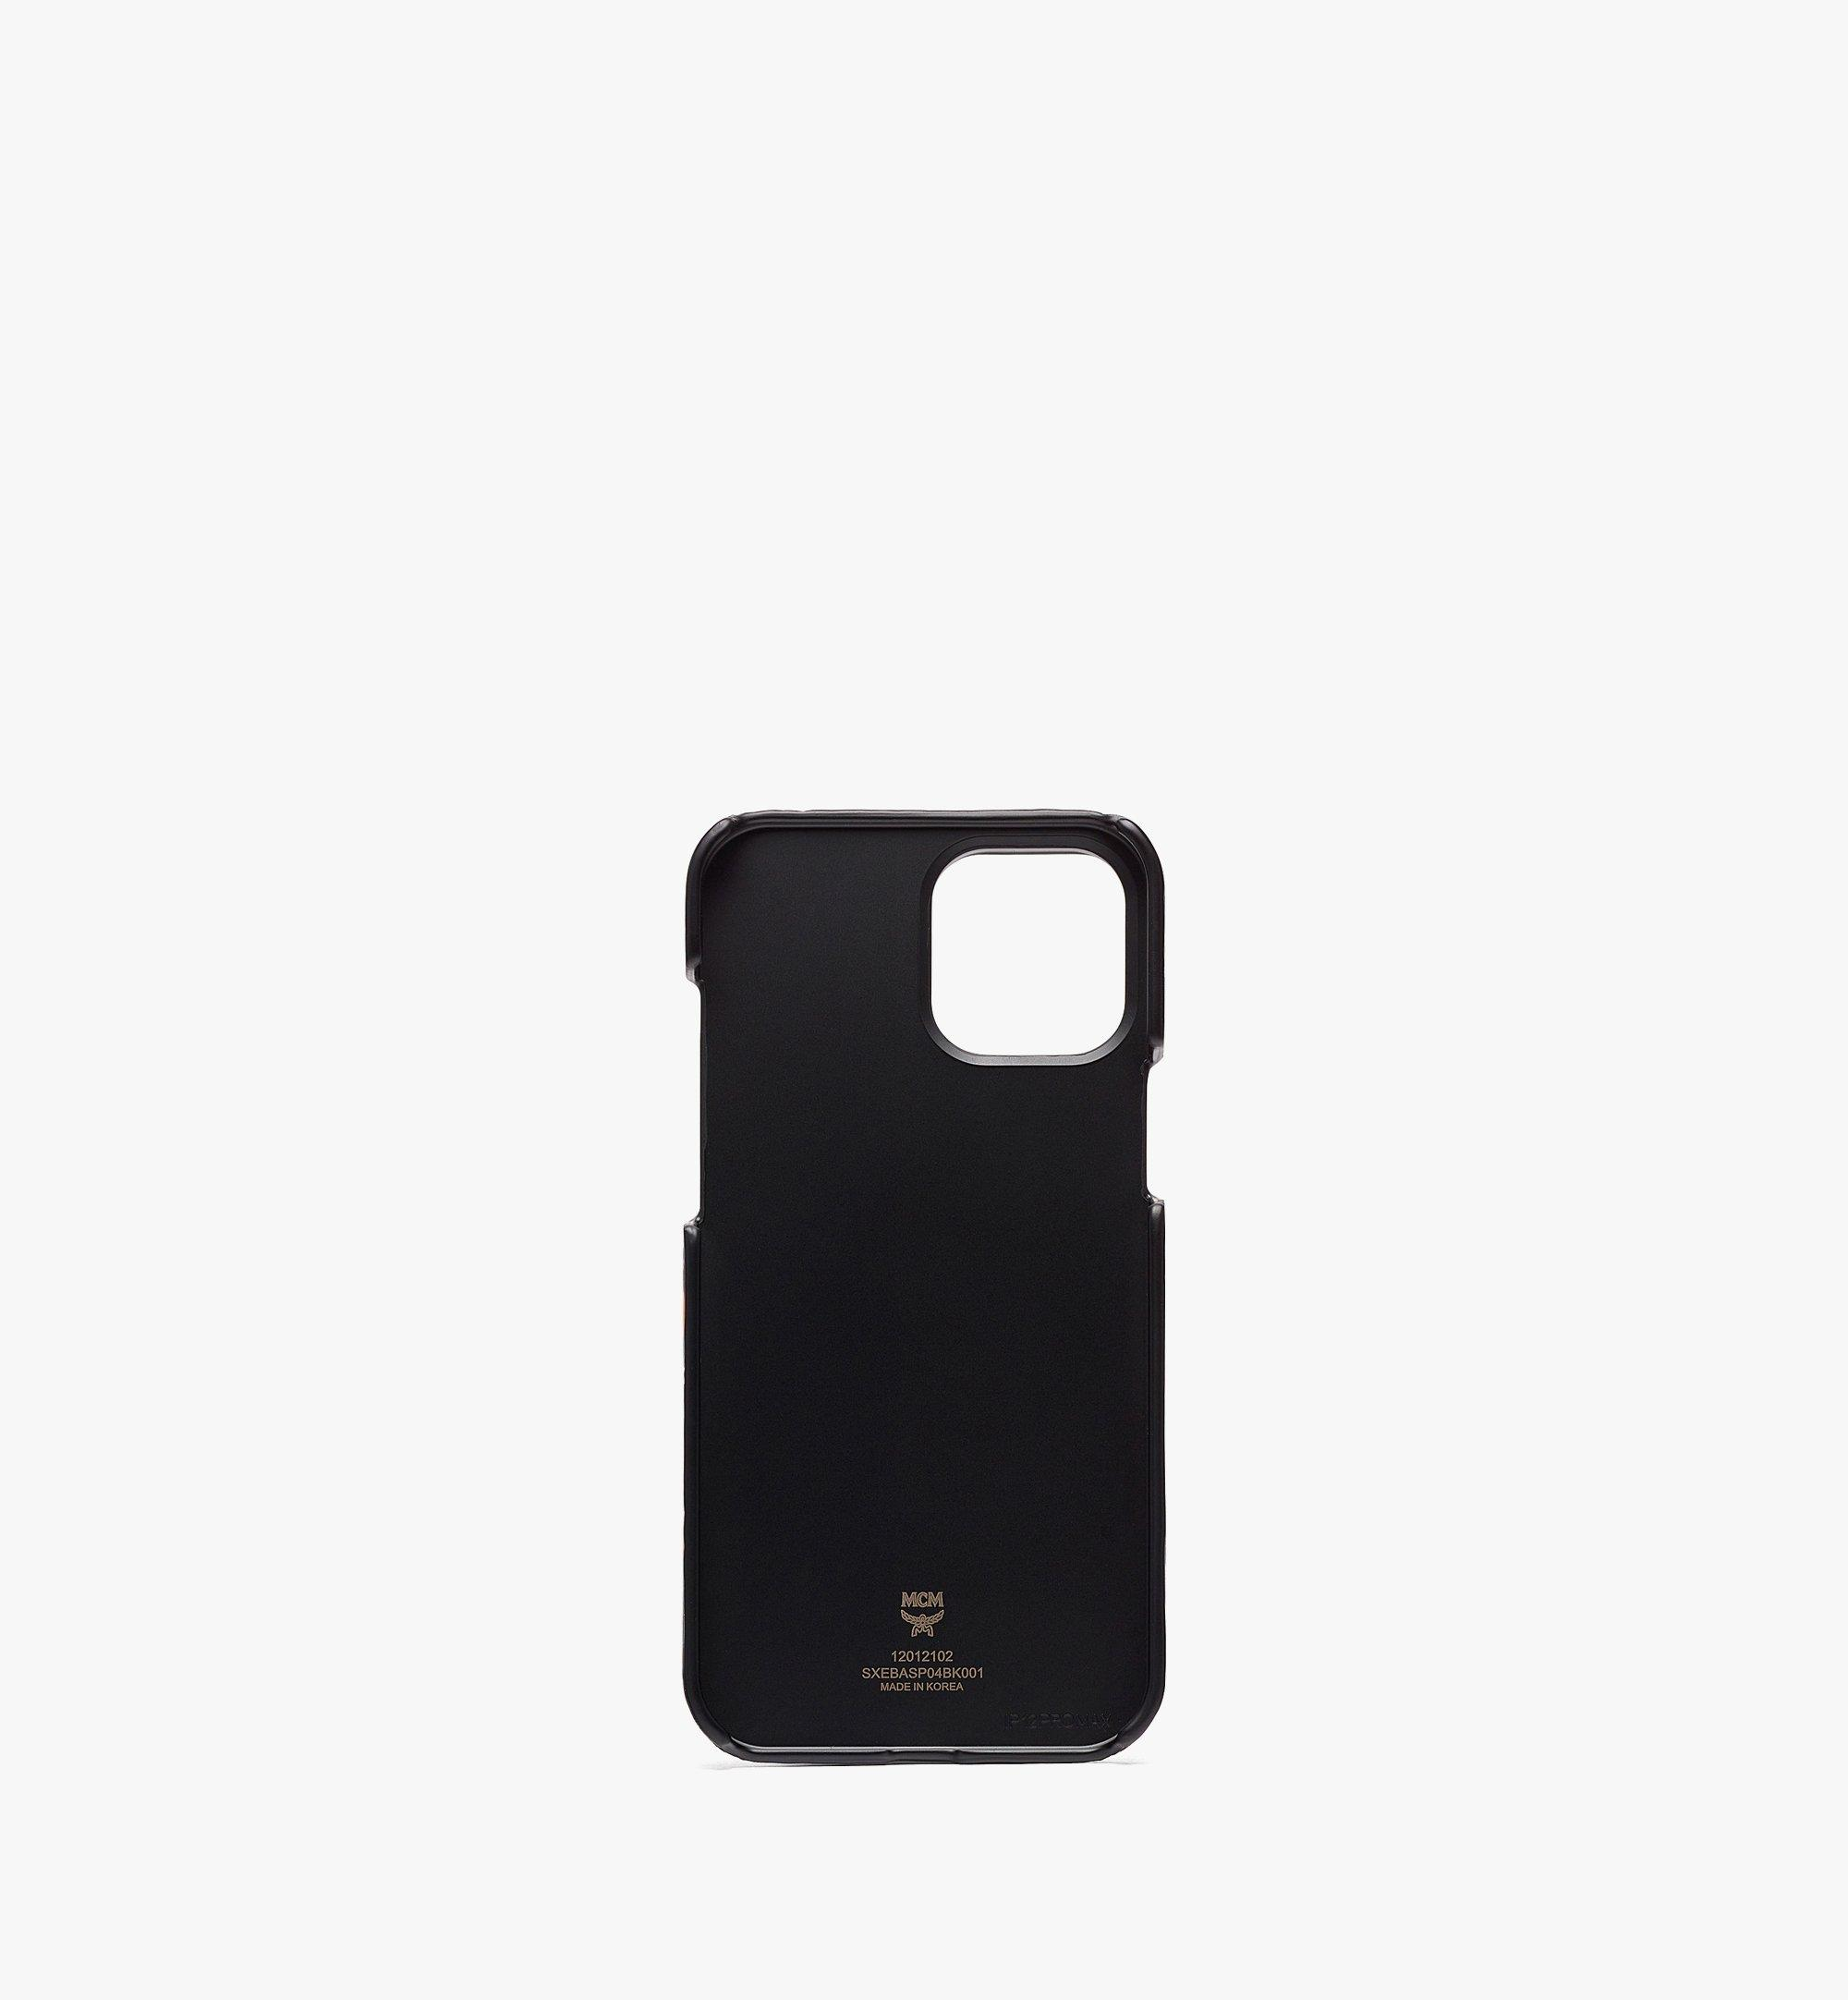 MCM MCM x SAMBYPEN iPhone 12 Pro Max 手機保護套 Black MXEBASP04BK001 更多視圖 1